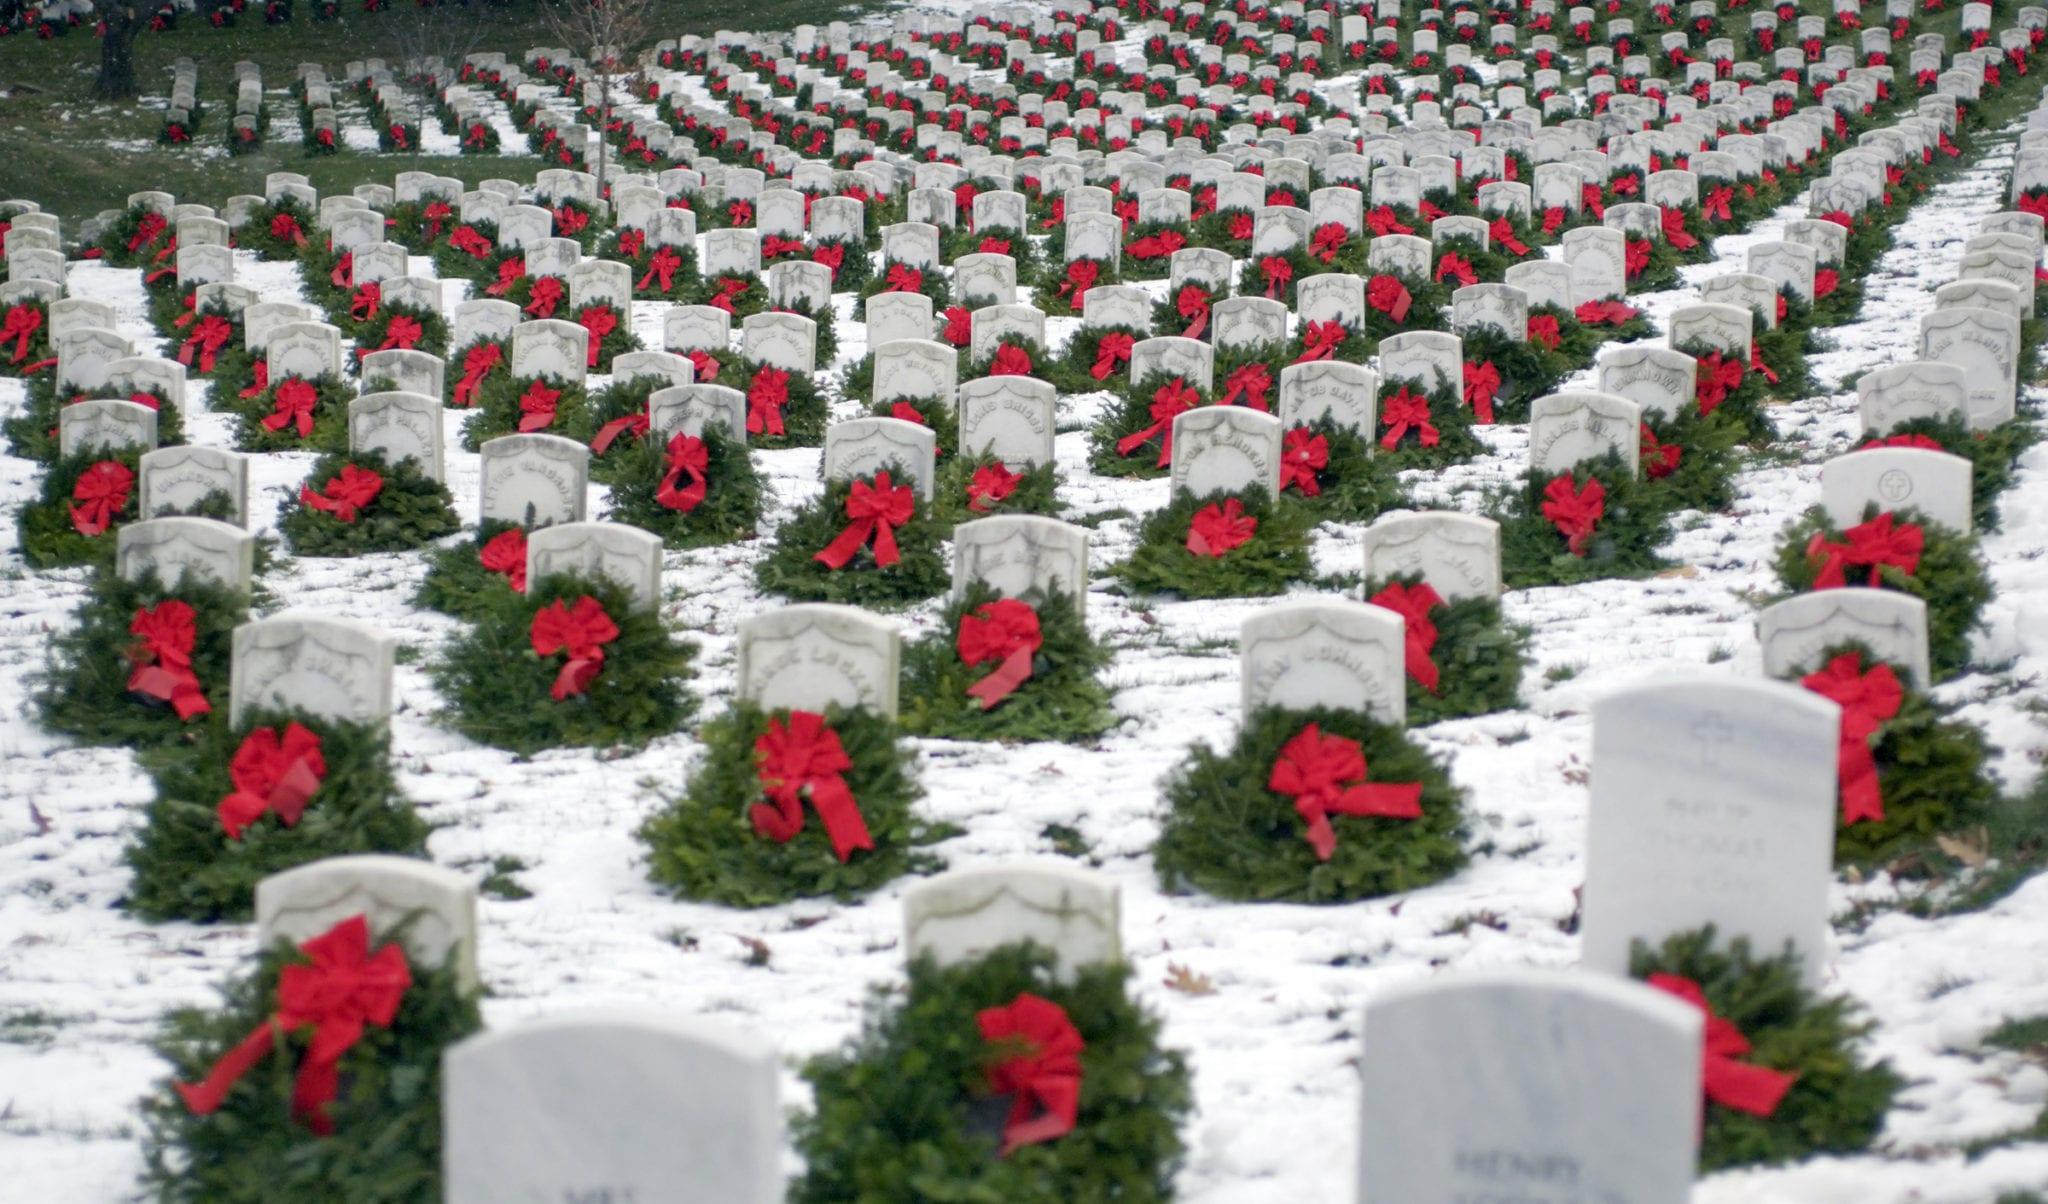 Wreaths Across America On Headstones